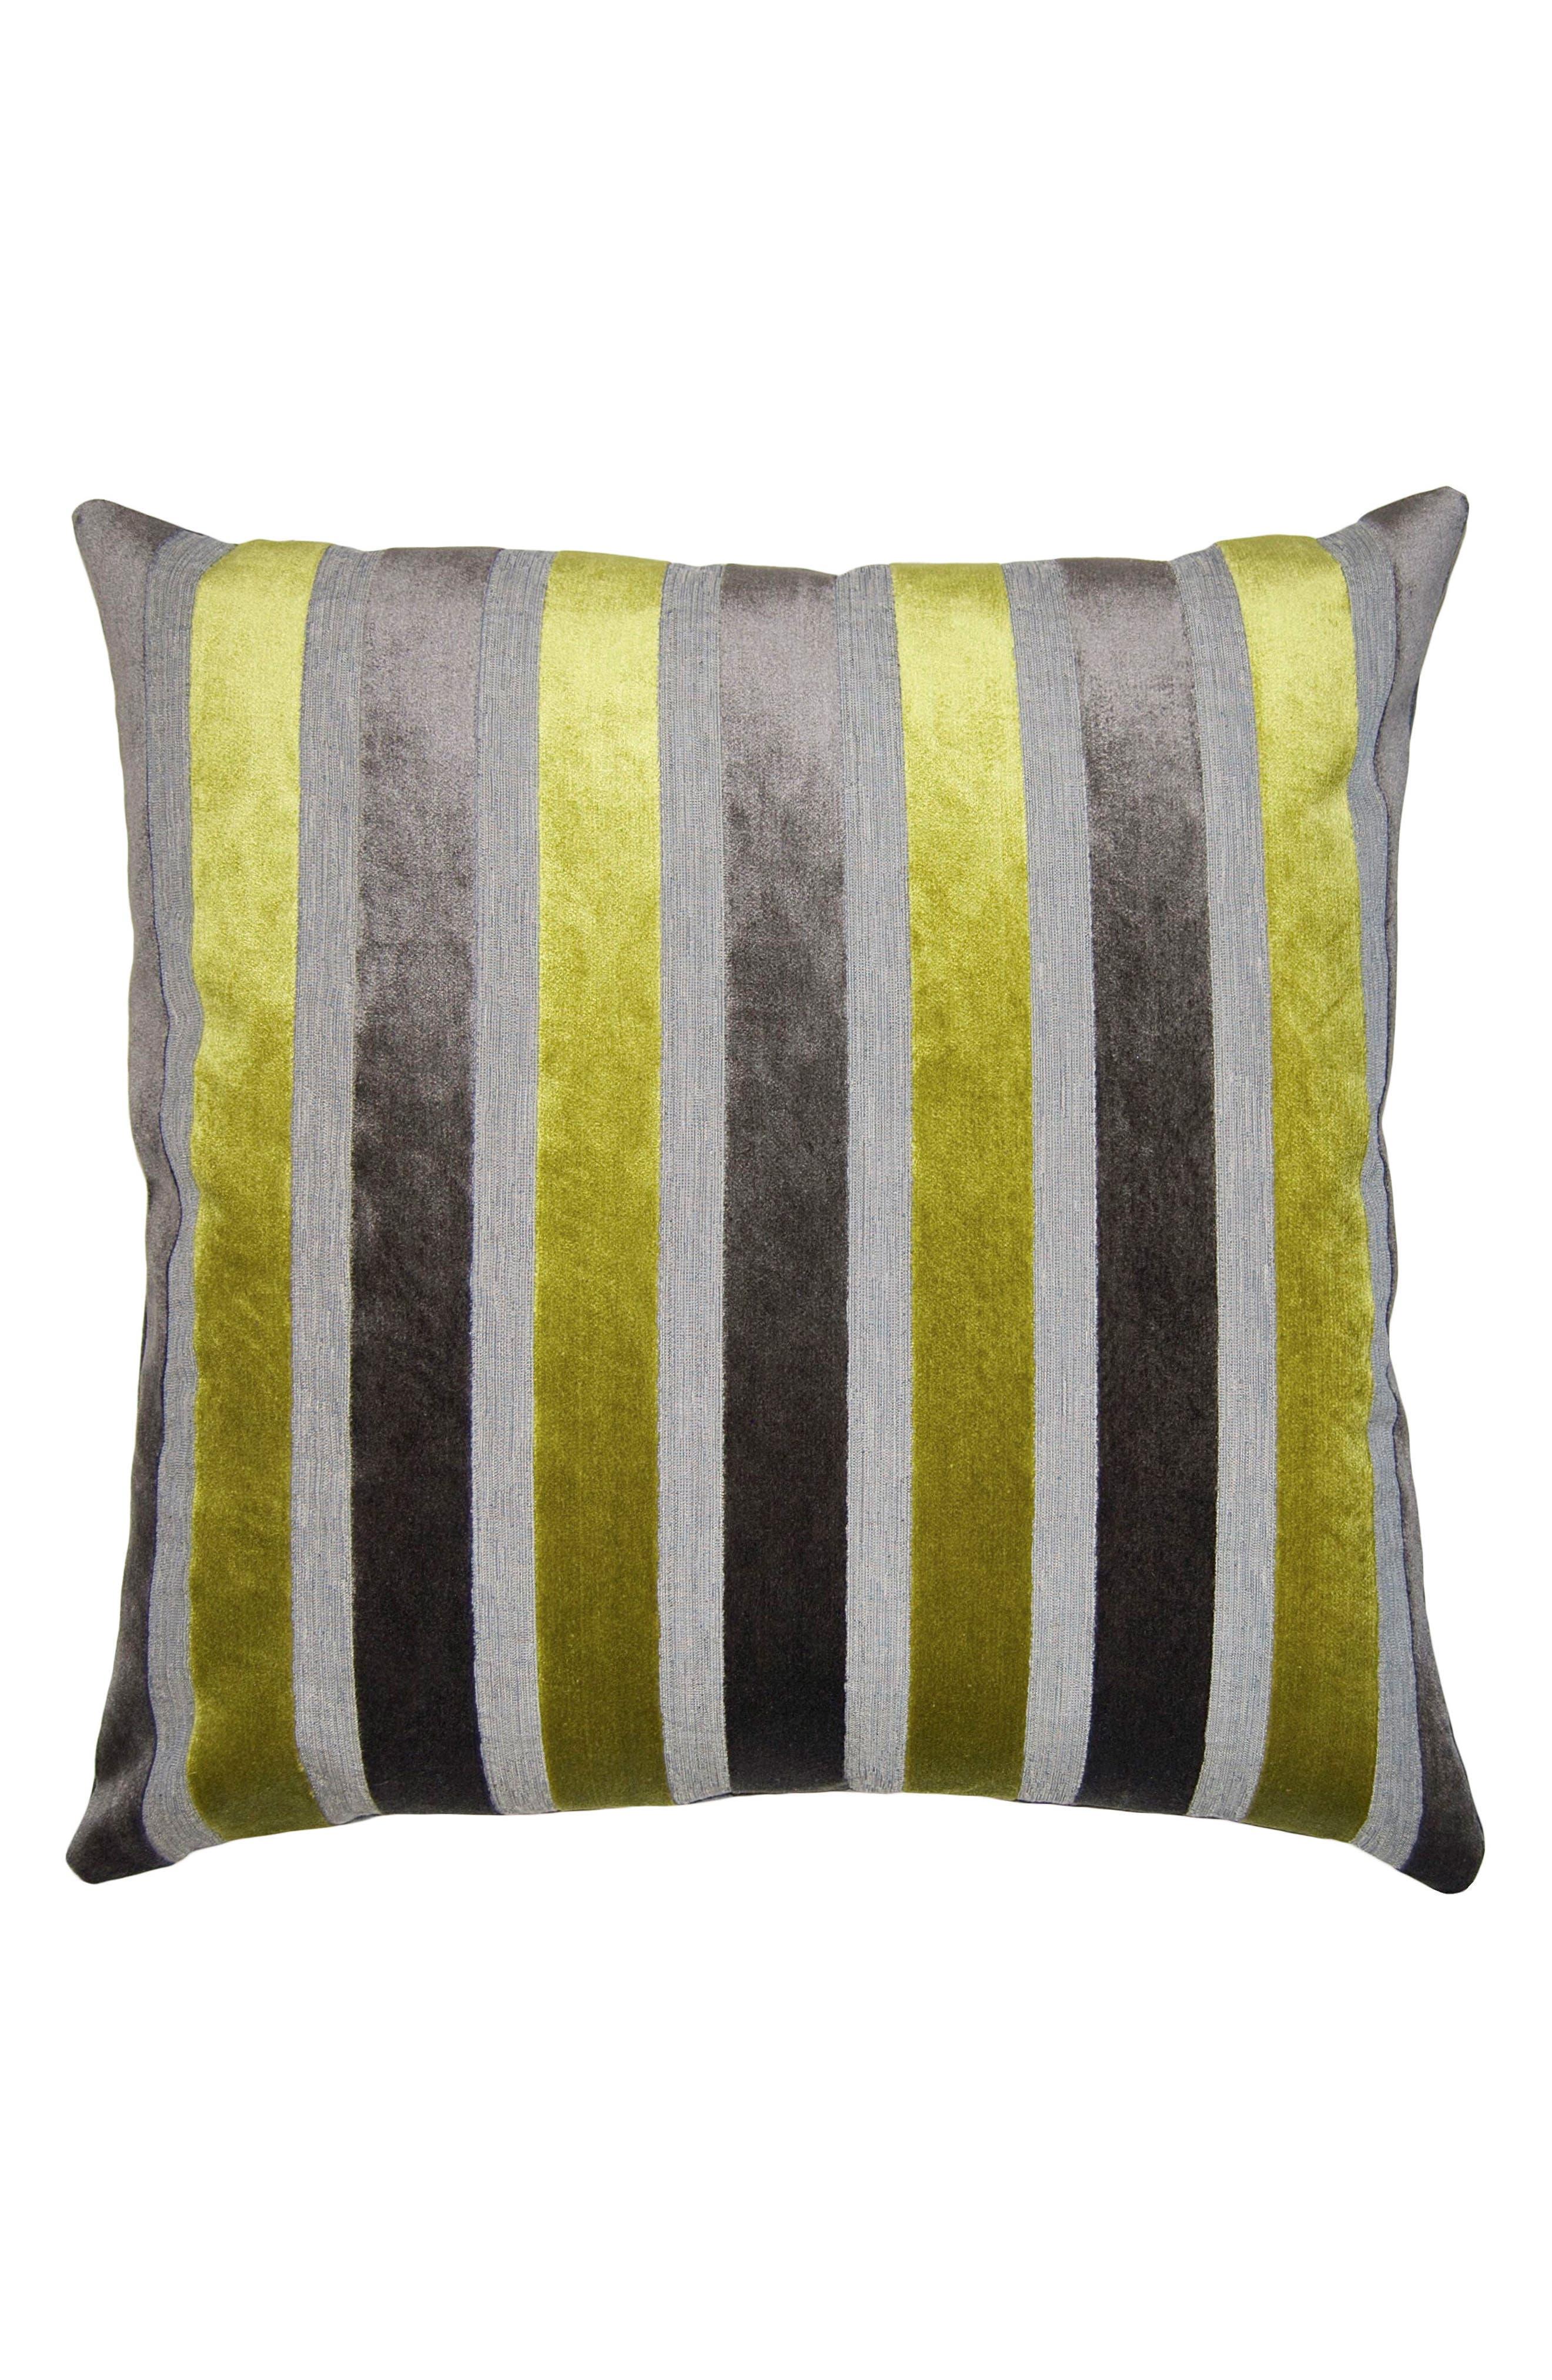 Stripe Accent Pillow,                             Main thumbnail 1, color,                             GREY MULTI